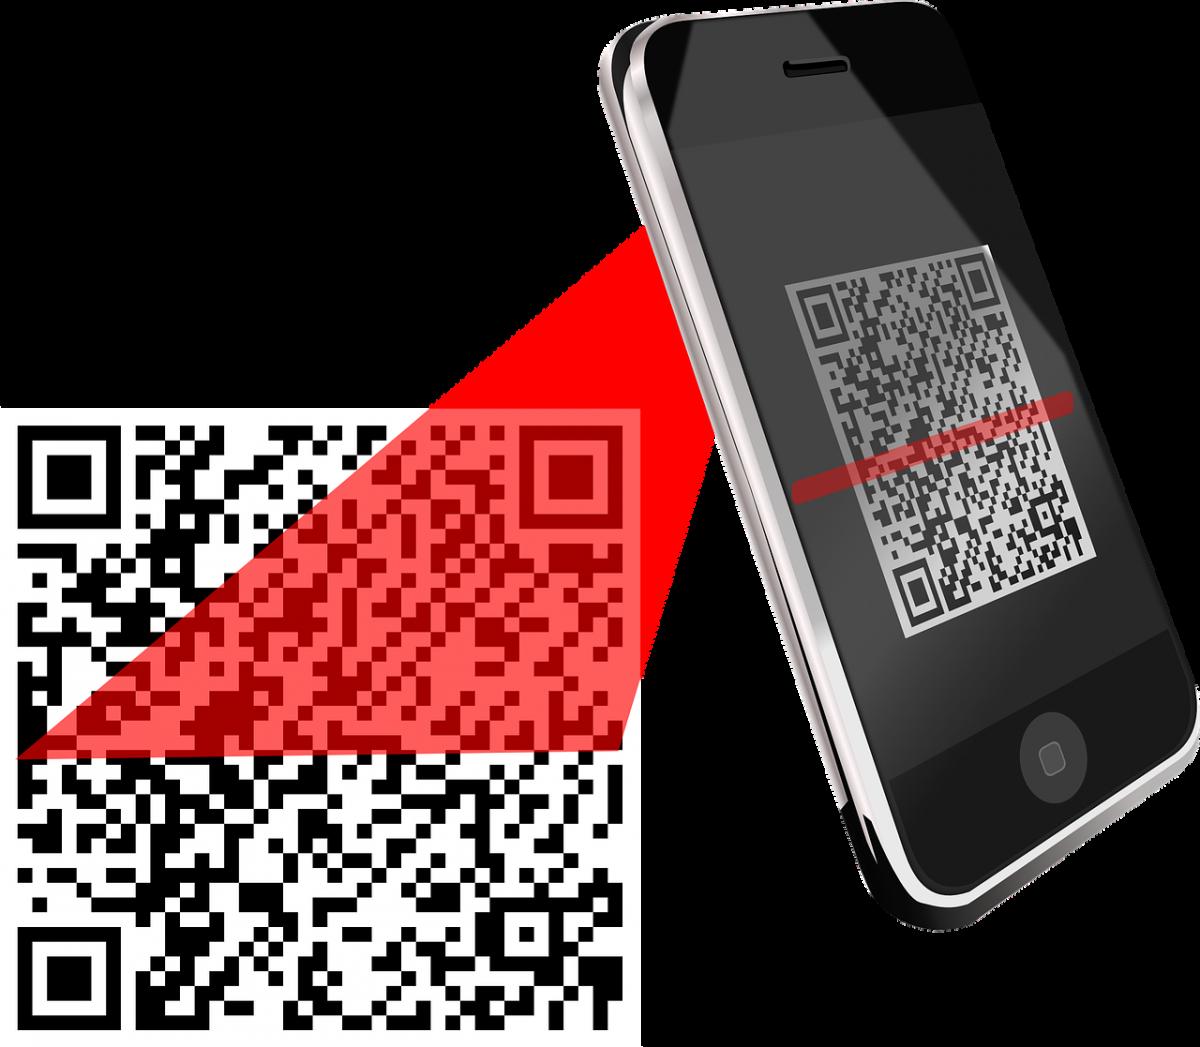 WLAN-QR-Code datenschutzfreundlich generieren